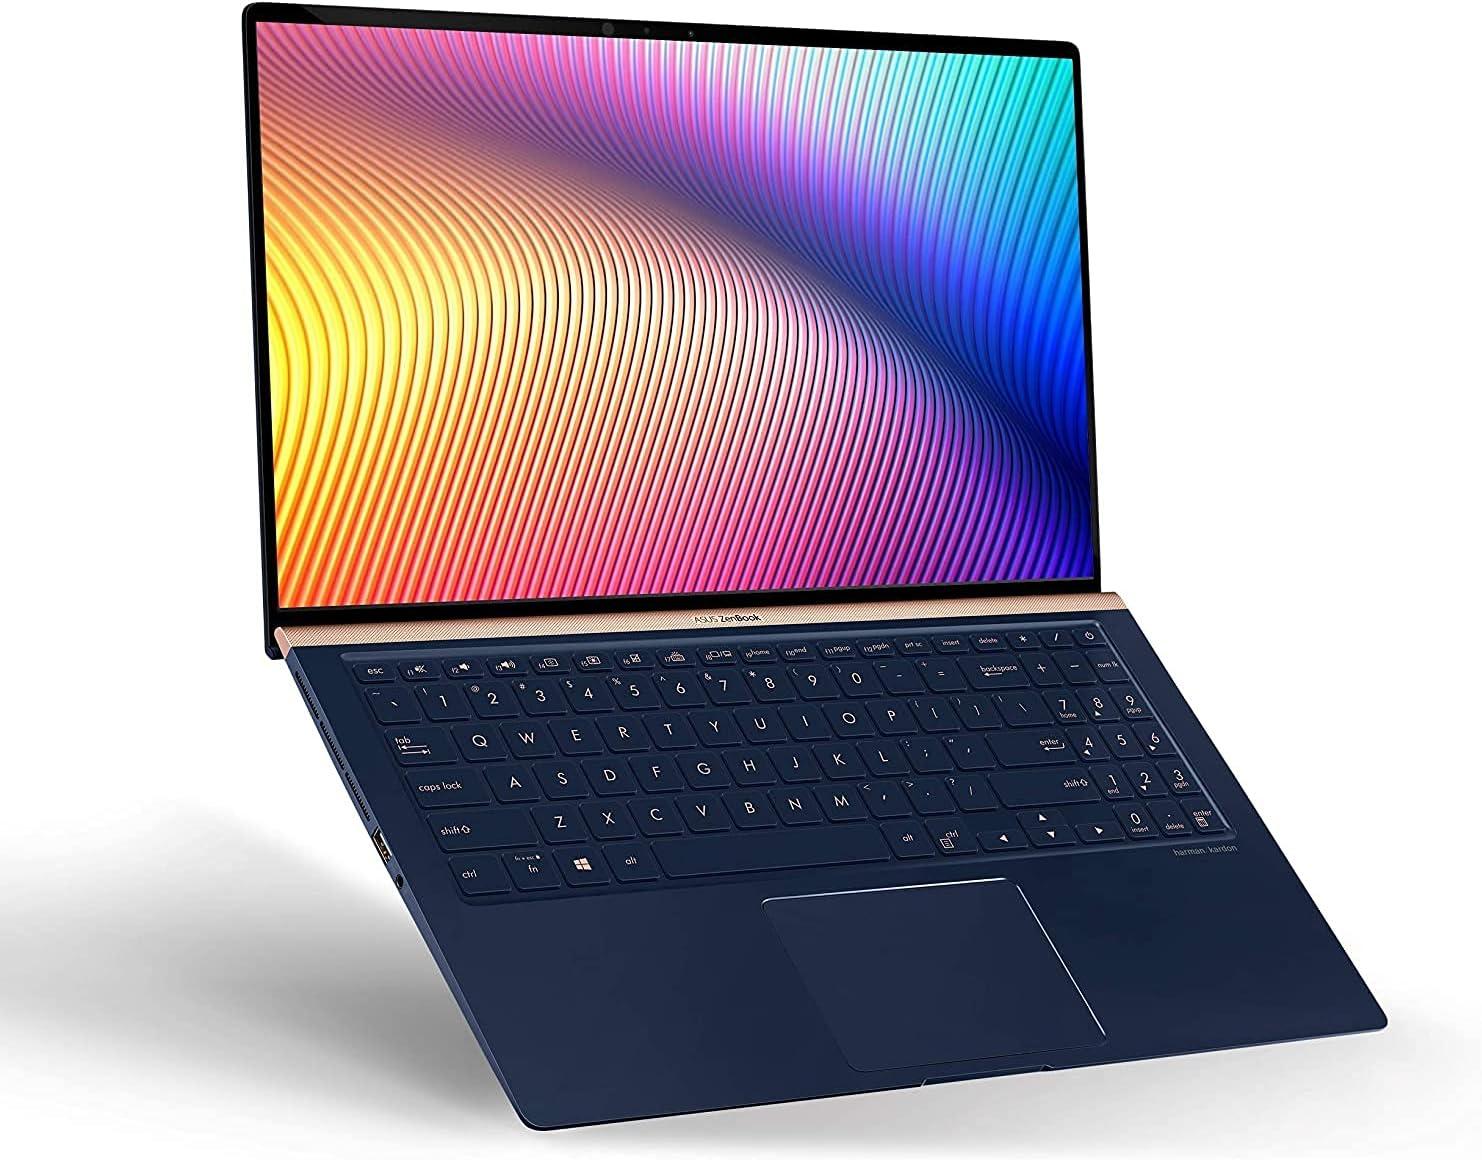 ASUS ZenBook Max 54% OFF 15 Ranking TOP3 Laptop 15.6 inches Intel Narrow 4-Way Bezel FHD